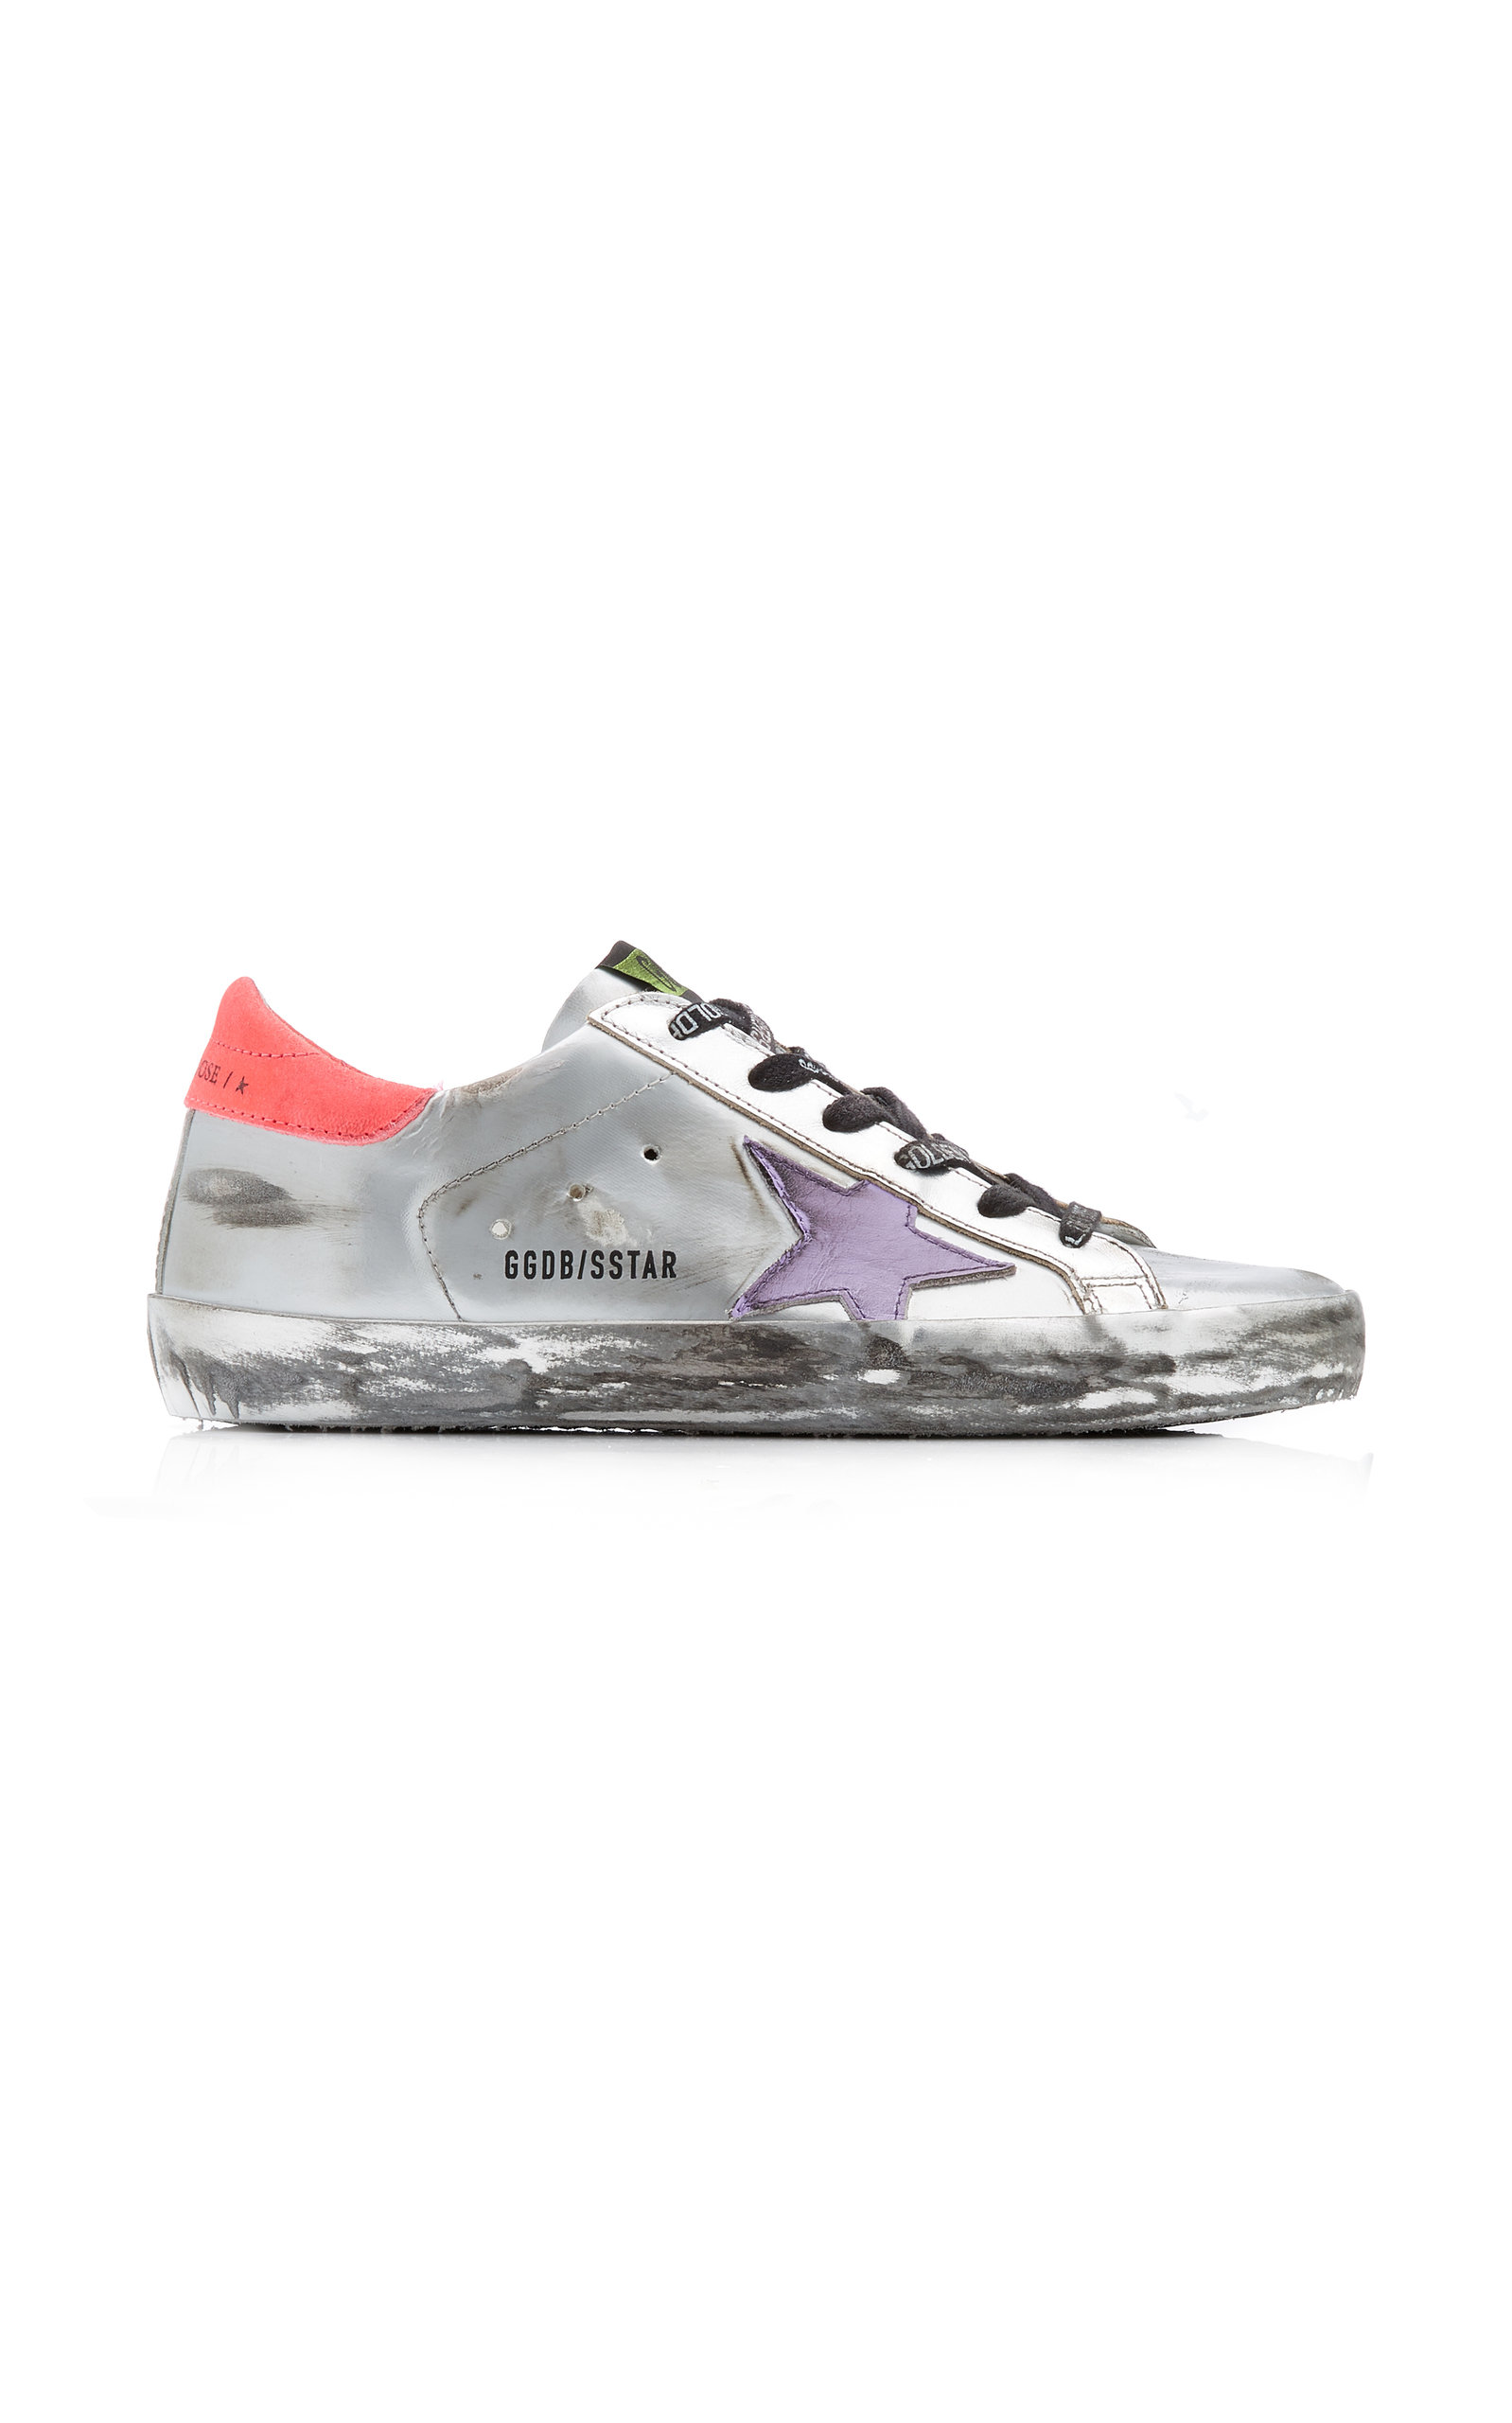 Golden Goose - Women's Superstar Metallic Patent Leather Sneakers  - Silver - Moda Operandi